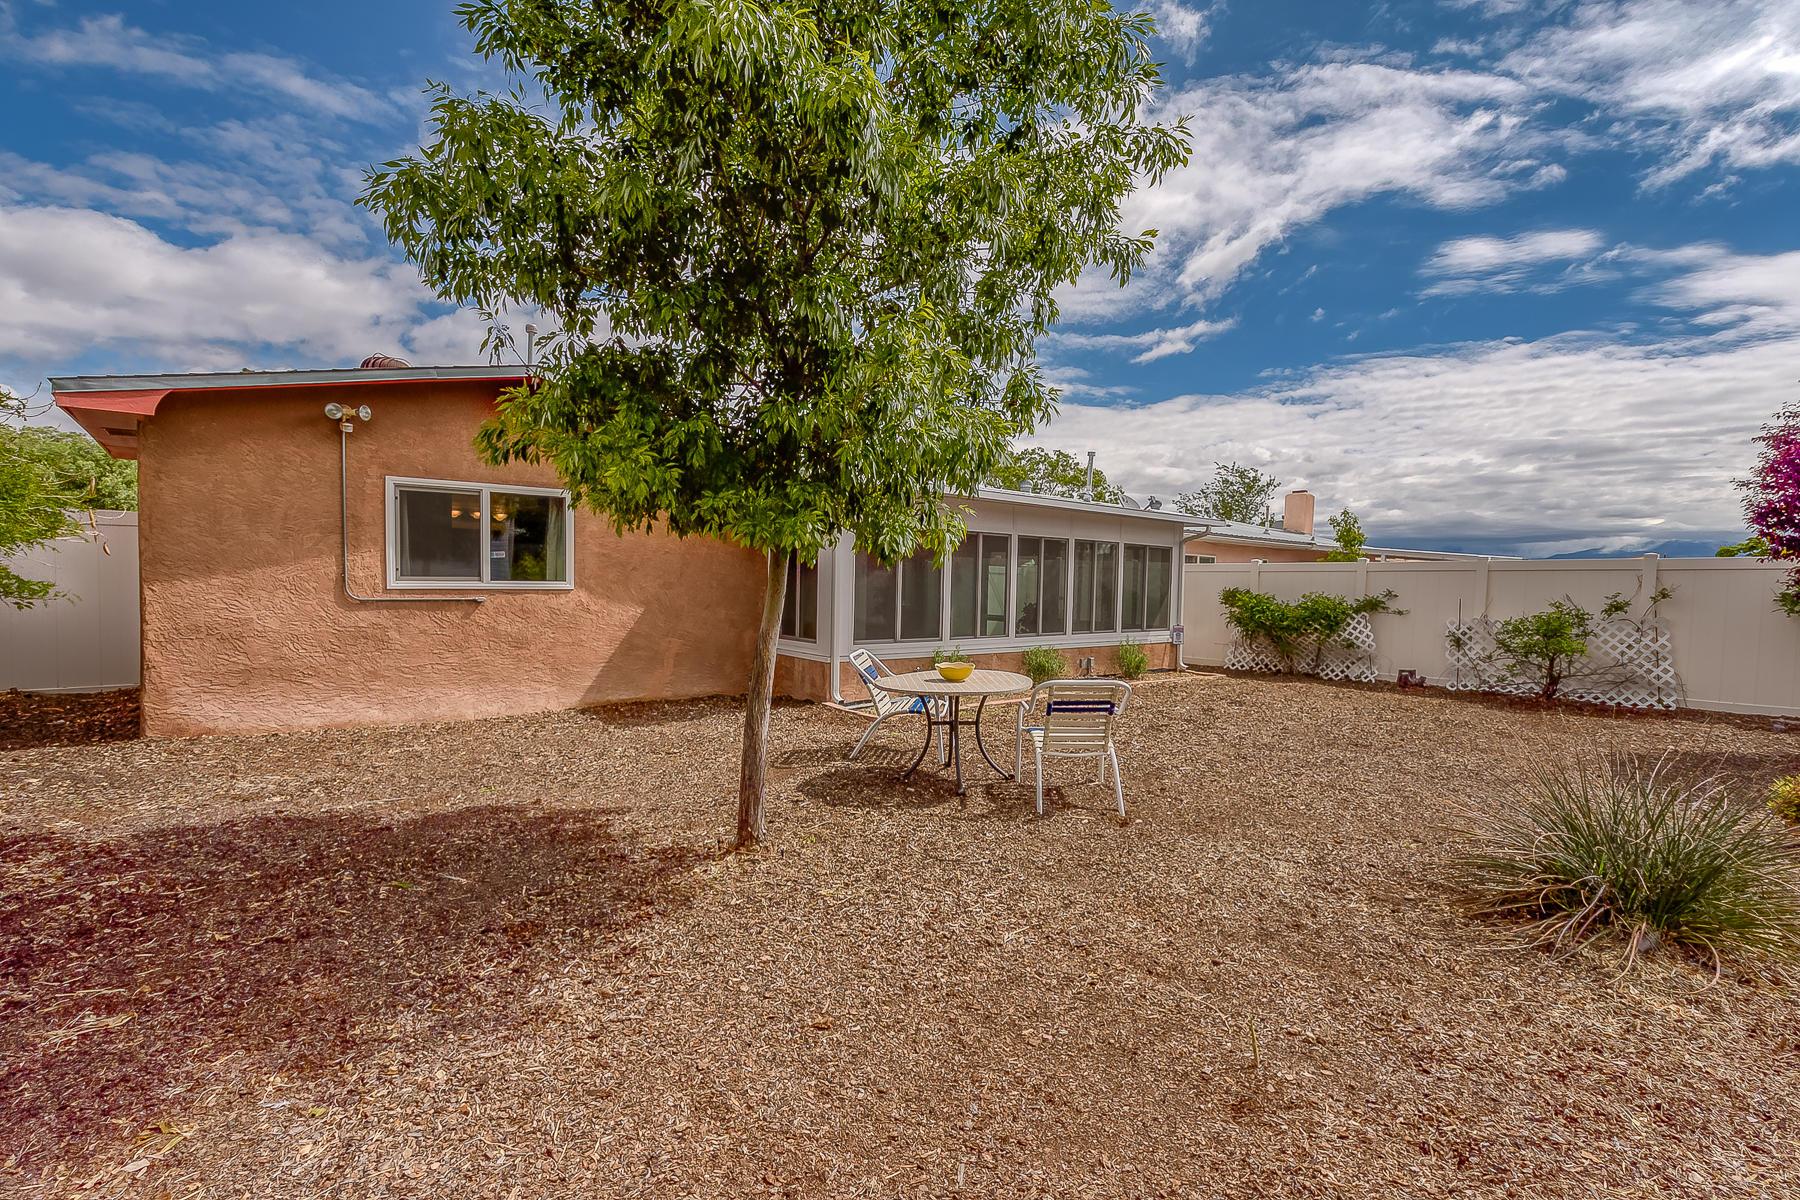 Photo of 5508 Hanover Road NW, Albuquerque, NM 87105